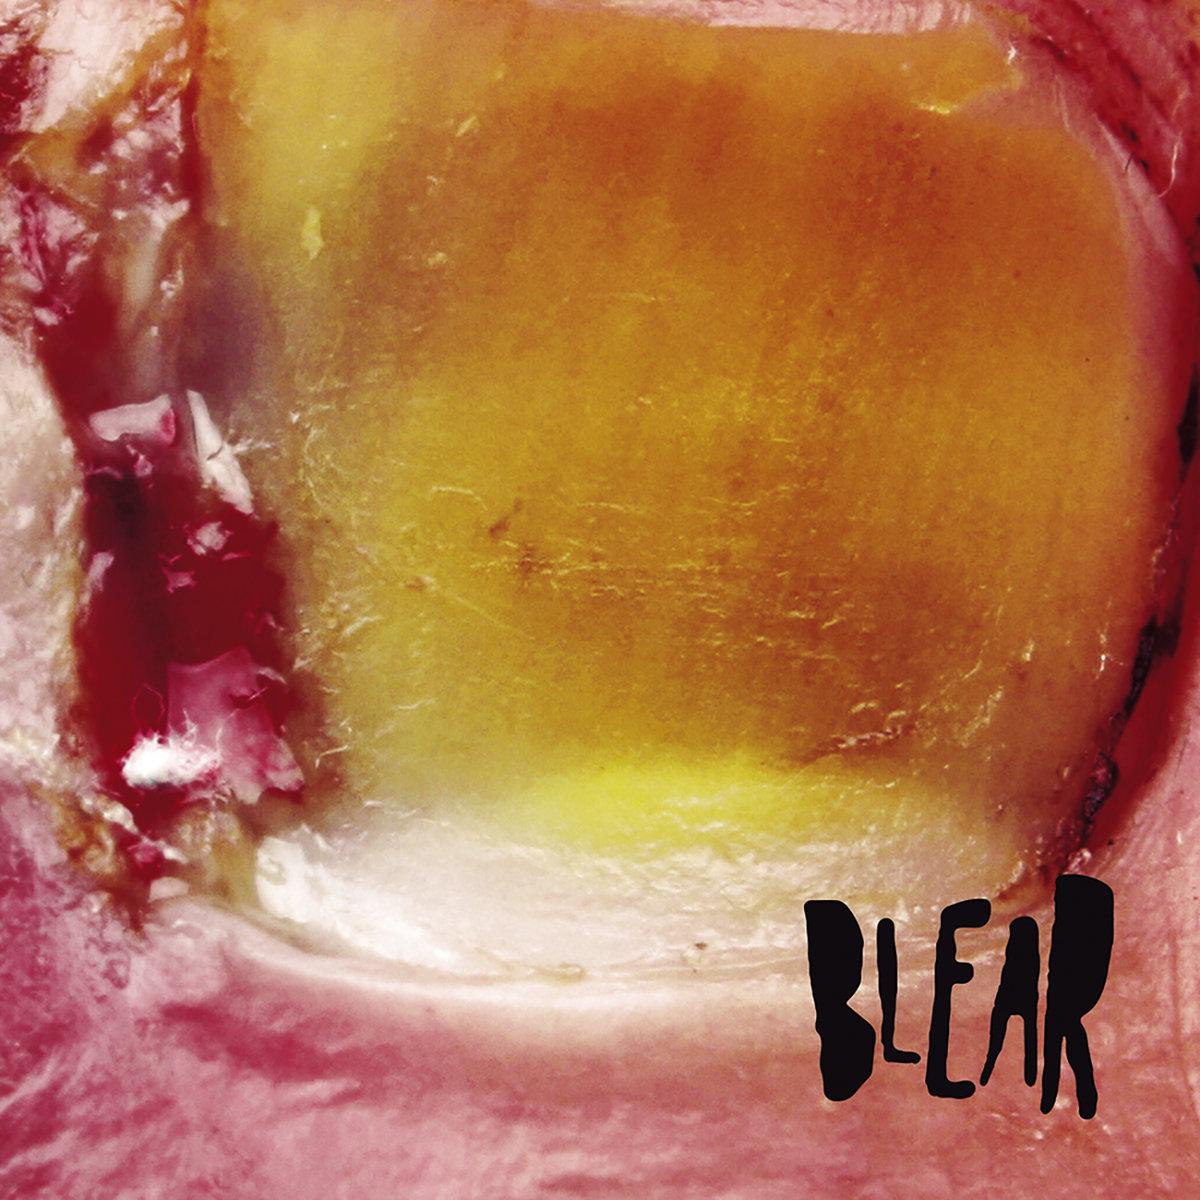 blear_blear